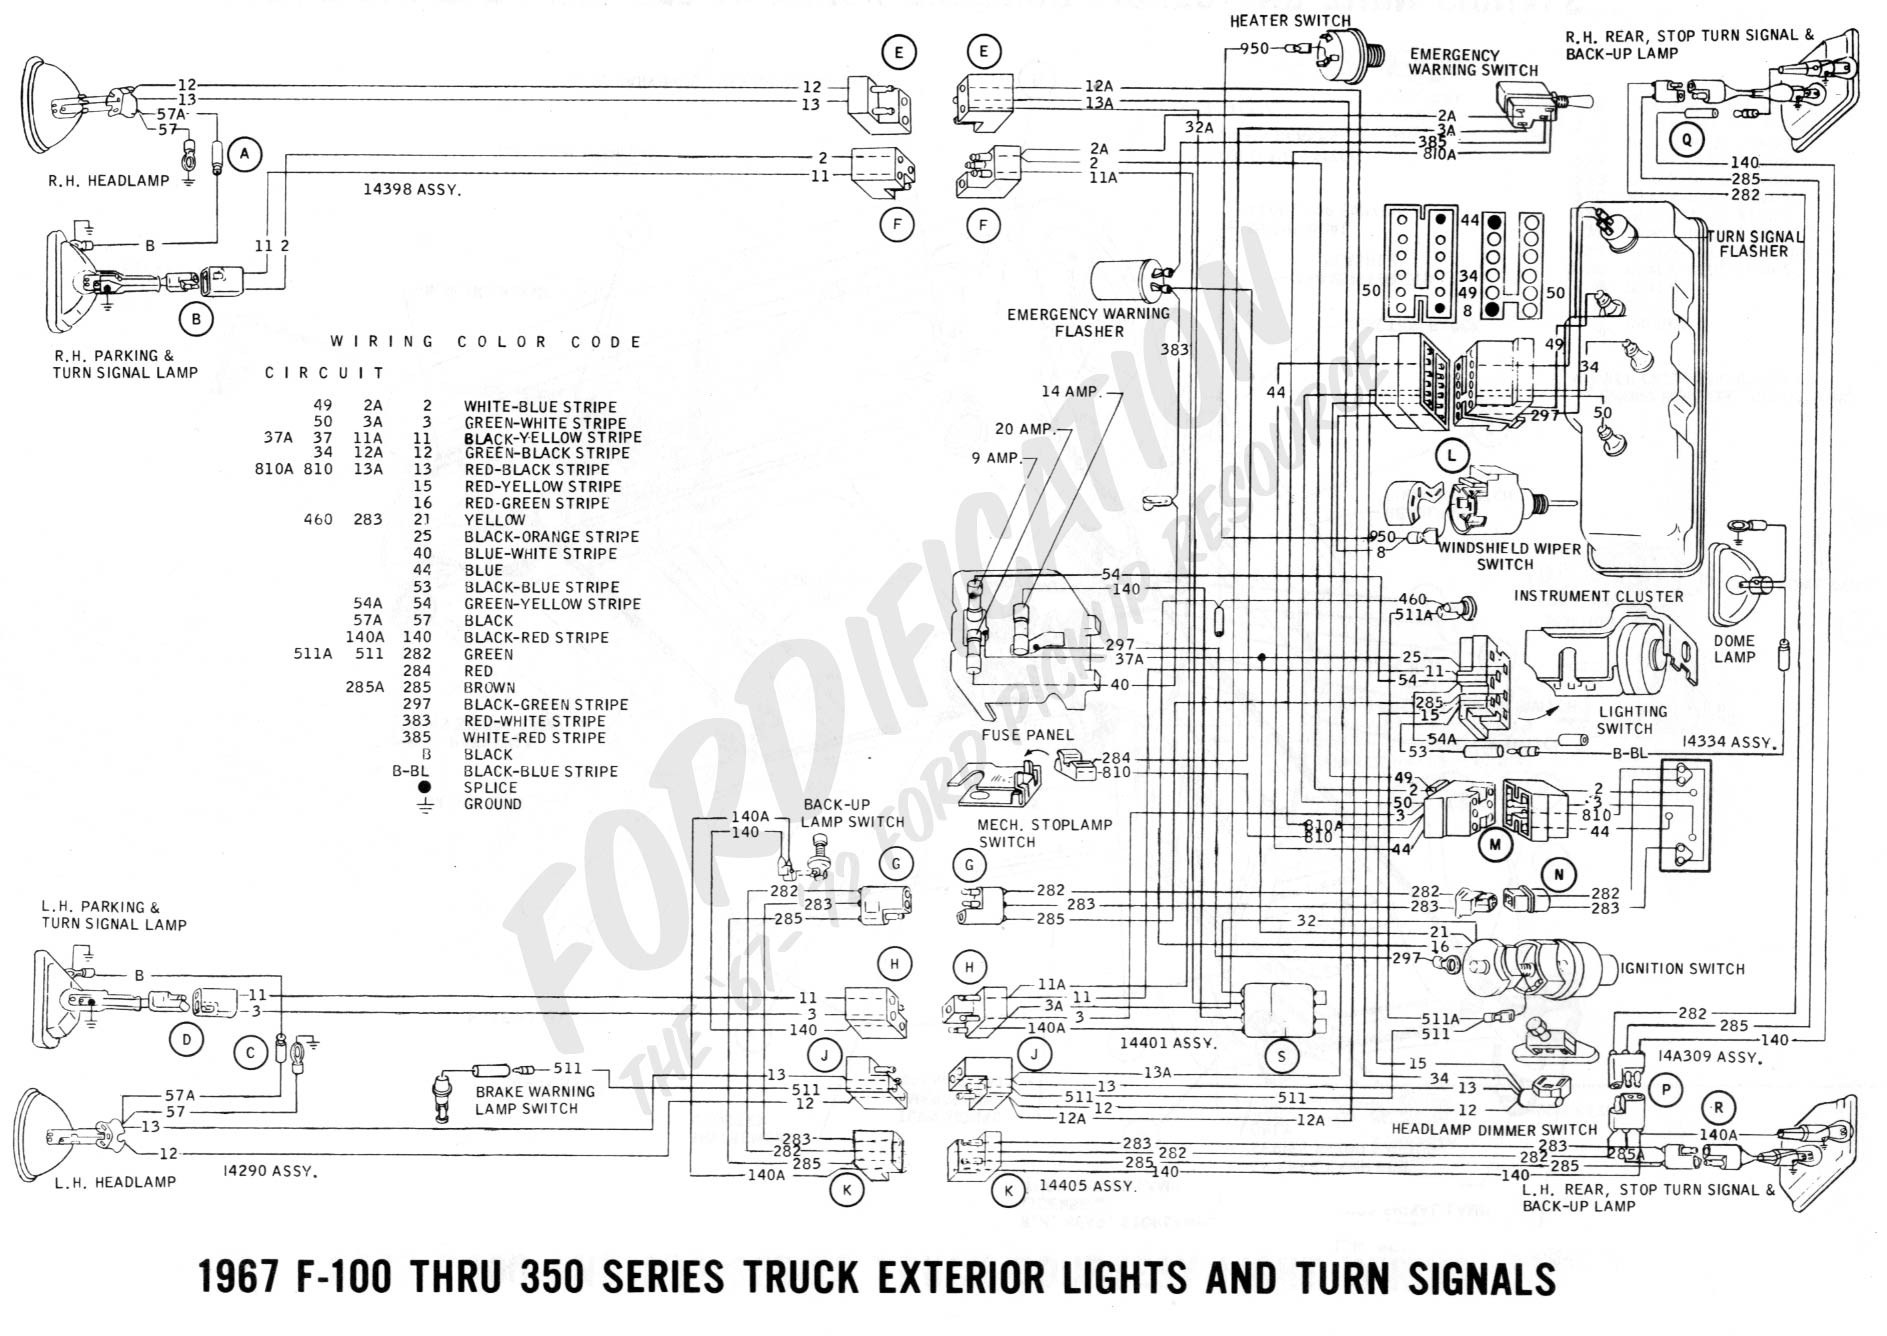 hight resolution of 2004 ford ranger engine diagram luxury ford ranger wiring harness diagram diagram of 2004 ford ranger